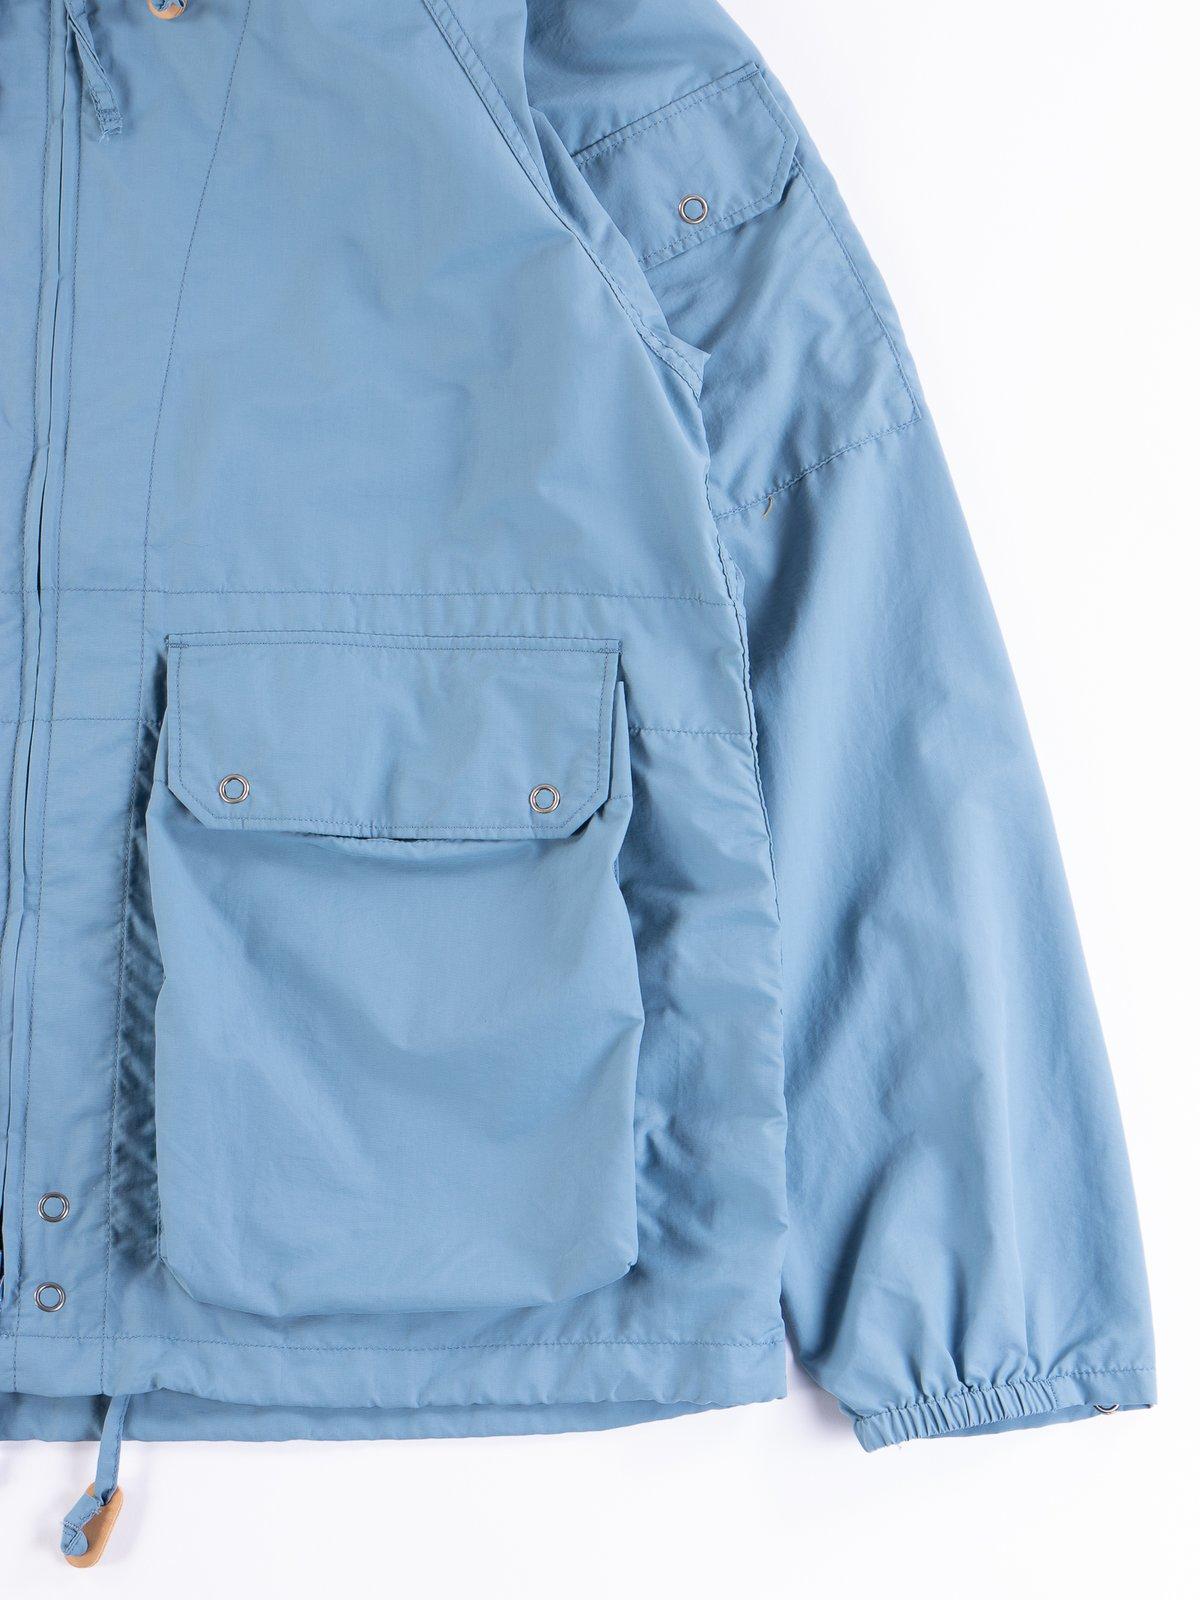 Light Blue Acrylic Coated Nylon Taffeta Atlantic Parka - Image 4